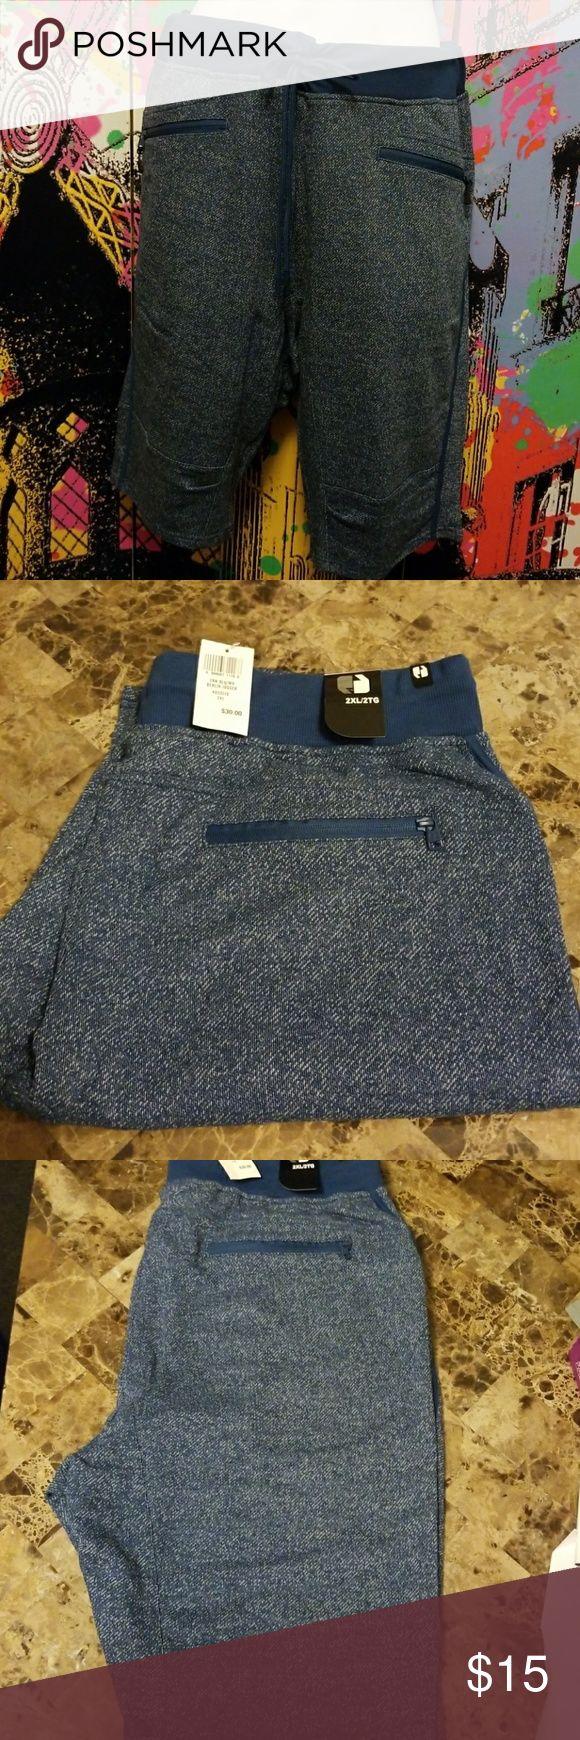 Berlin Jogger Blue jogger with zipper pockets Shorts Hybrids